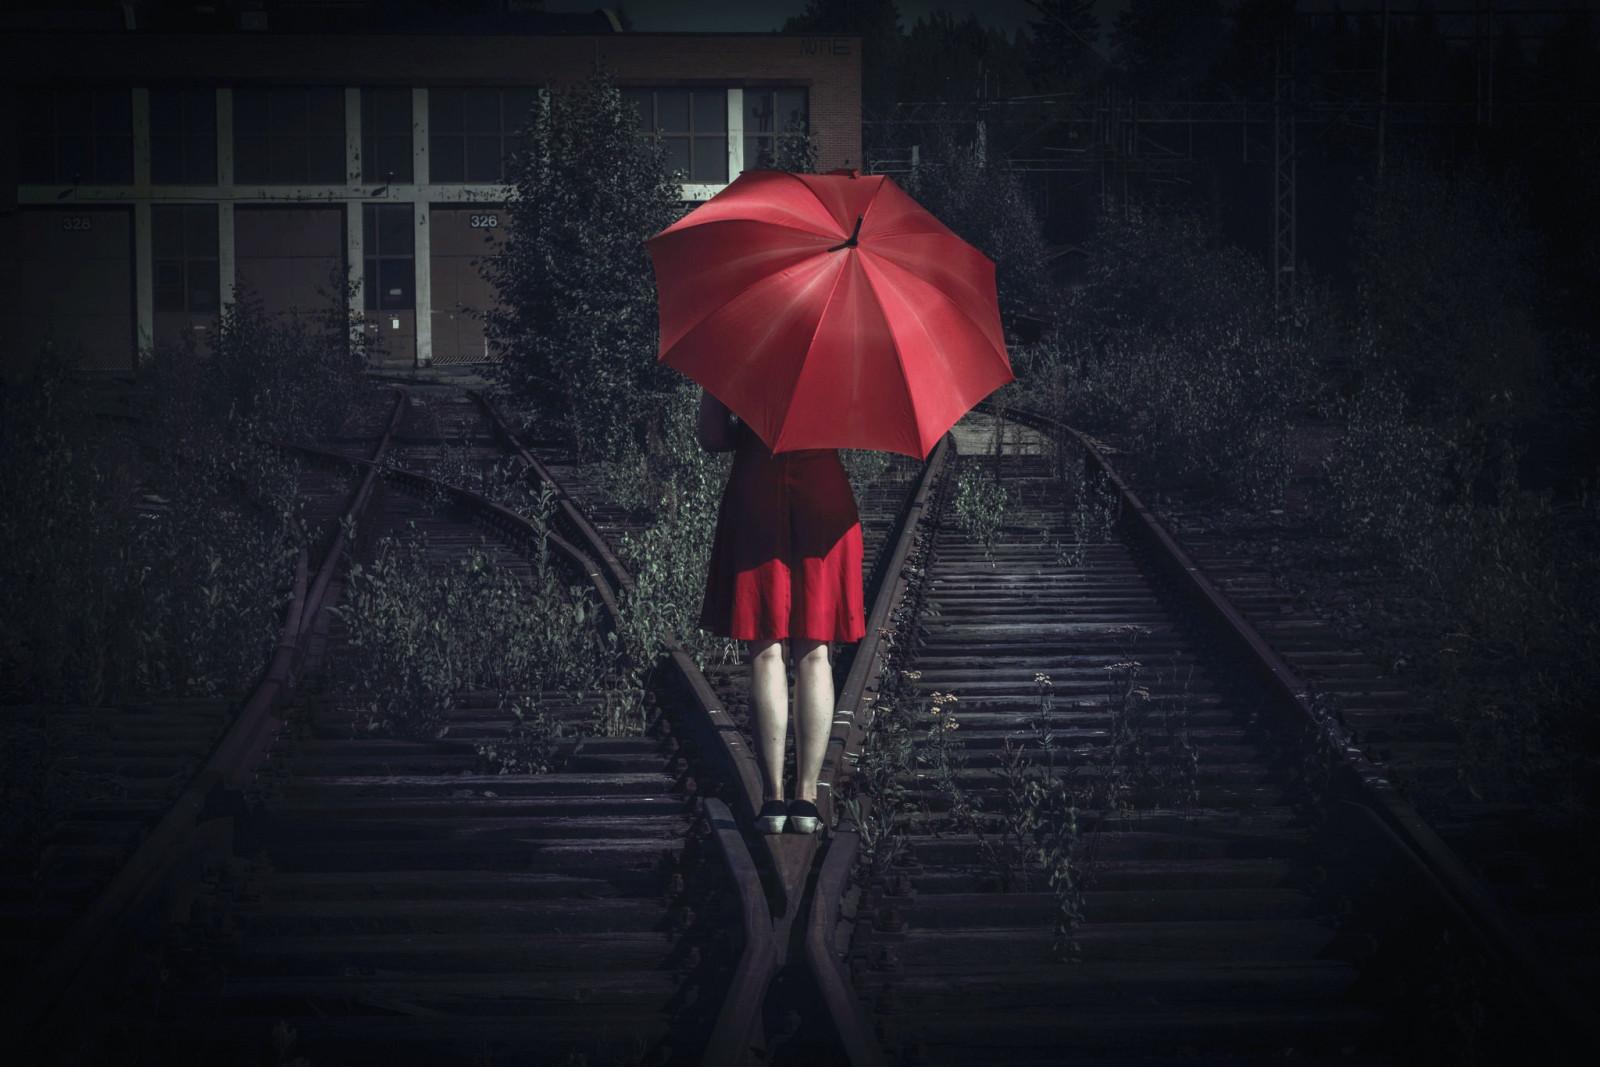 Women Railway Red Umbrella